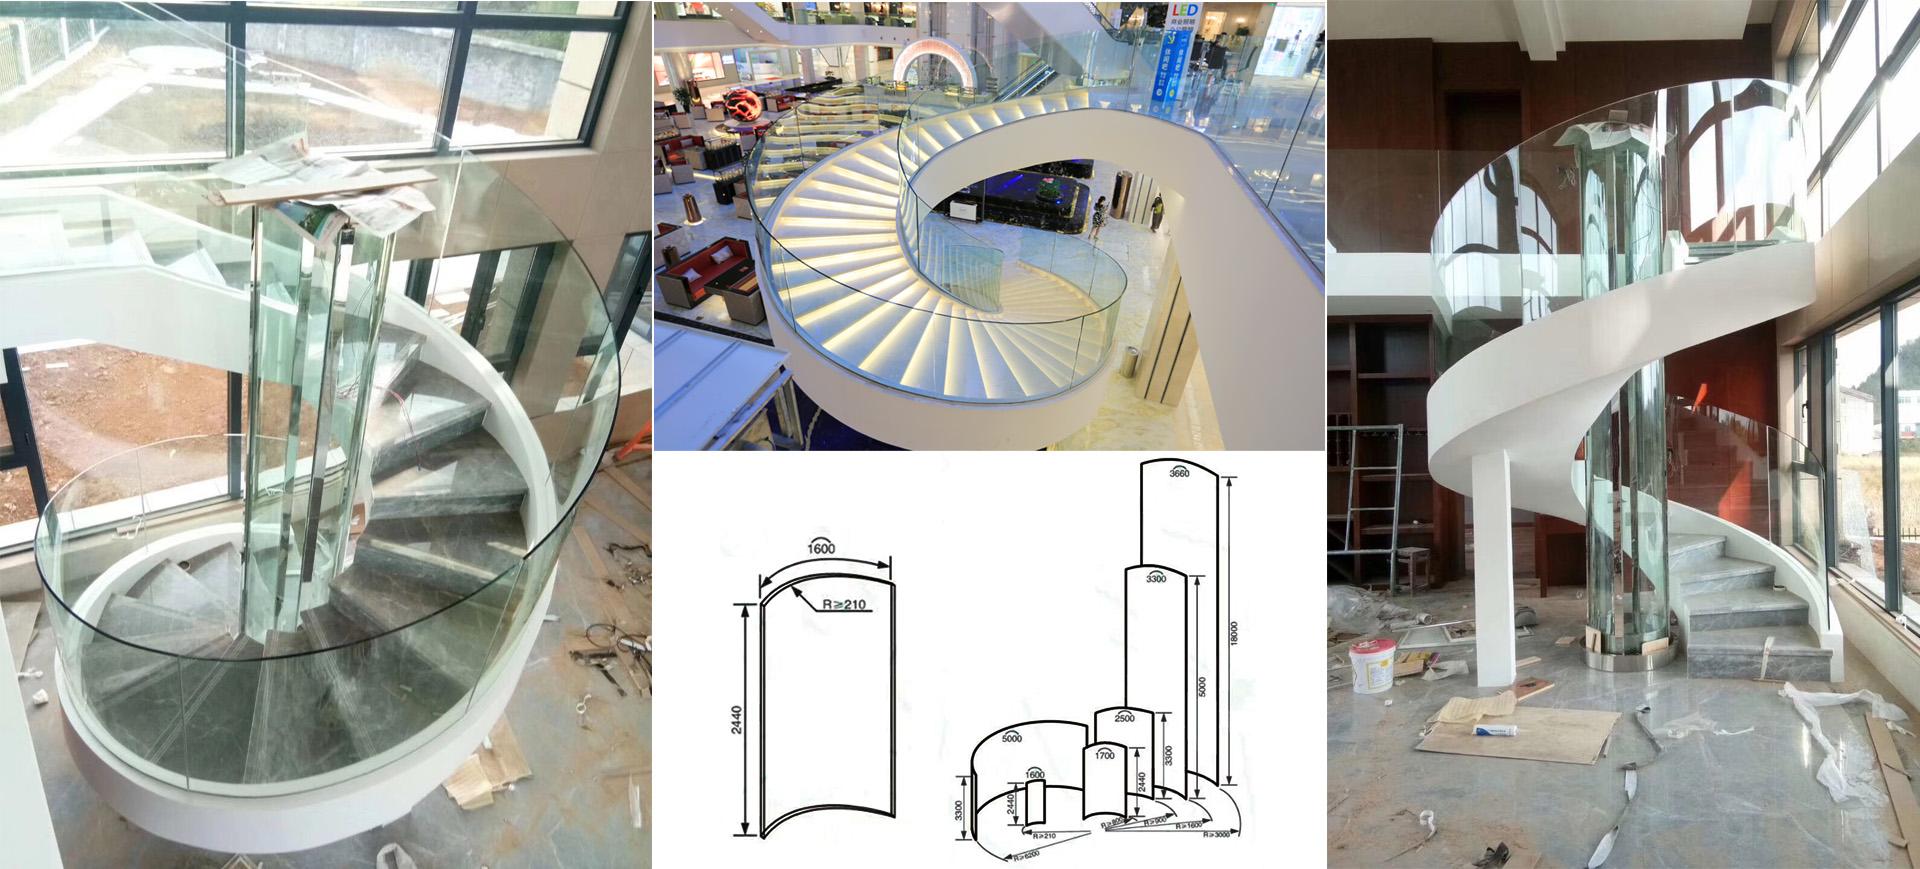 BTG better glass 15mm curved glass balustrade